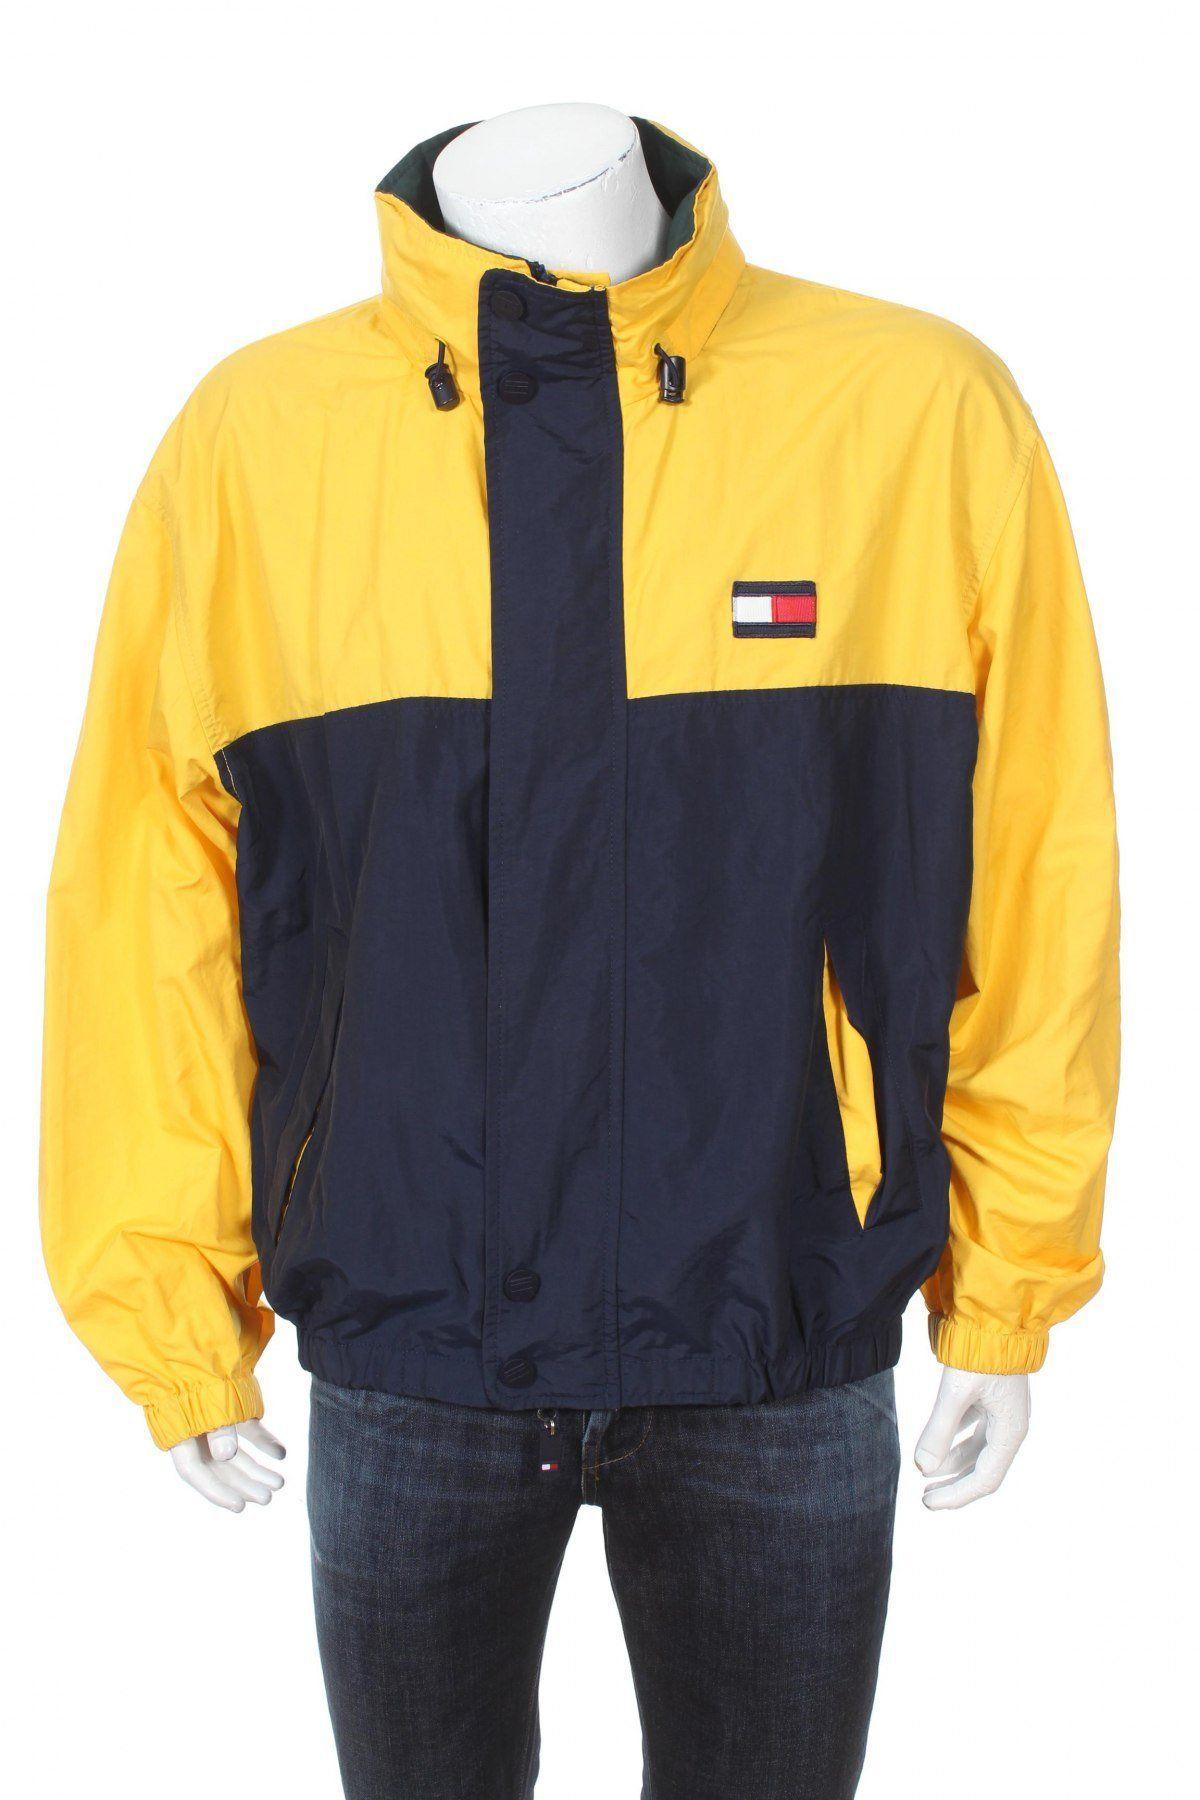 Vintage 90s Tommy Hilfiger Windbreaker Jacket Big Logo Spell Out Navy Blue Yellow Green Size Xl Tommy Hilfiger Windbreaker Windbreaker Jacket Tommy Hilfiger [ 1800 x 1200 Pixel ]